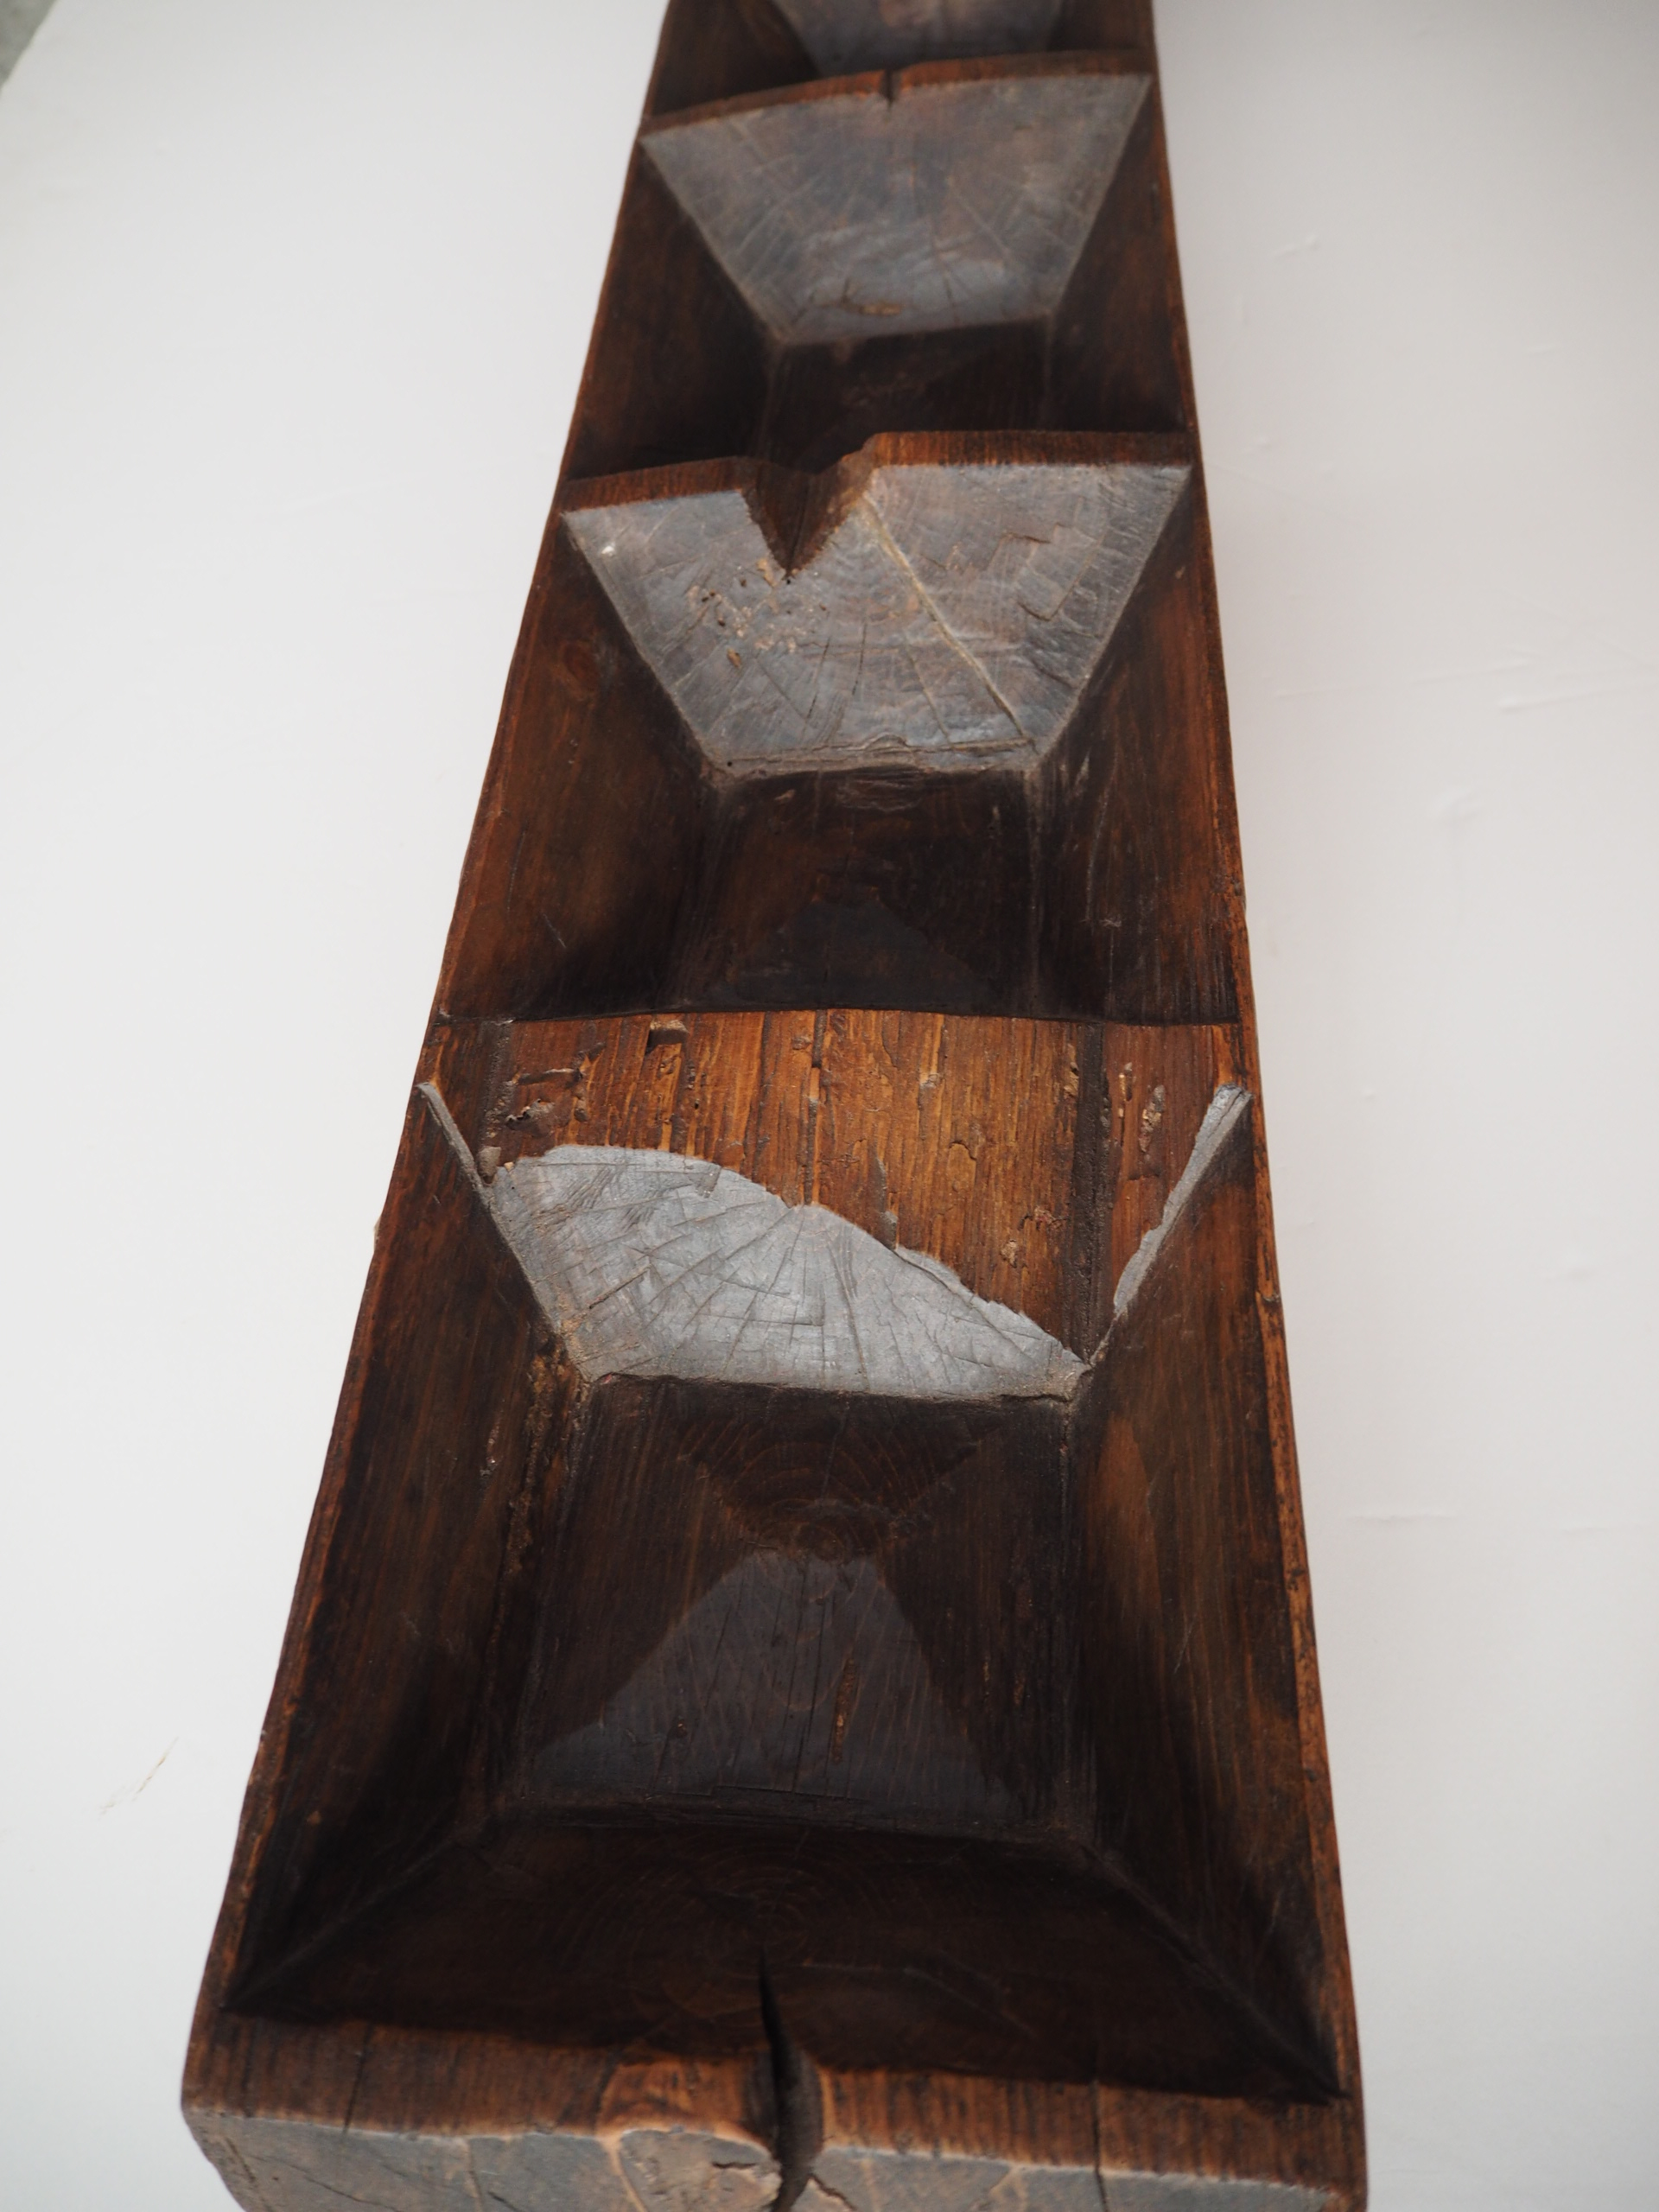 Antique 19th Century ottoman period wooden dough riser